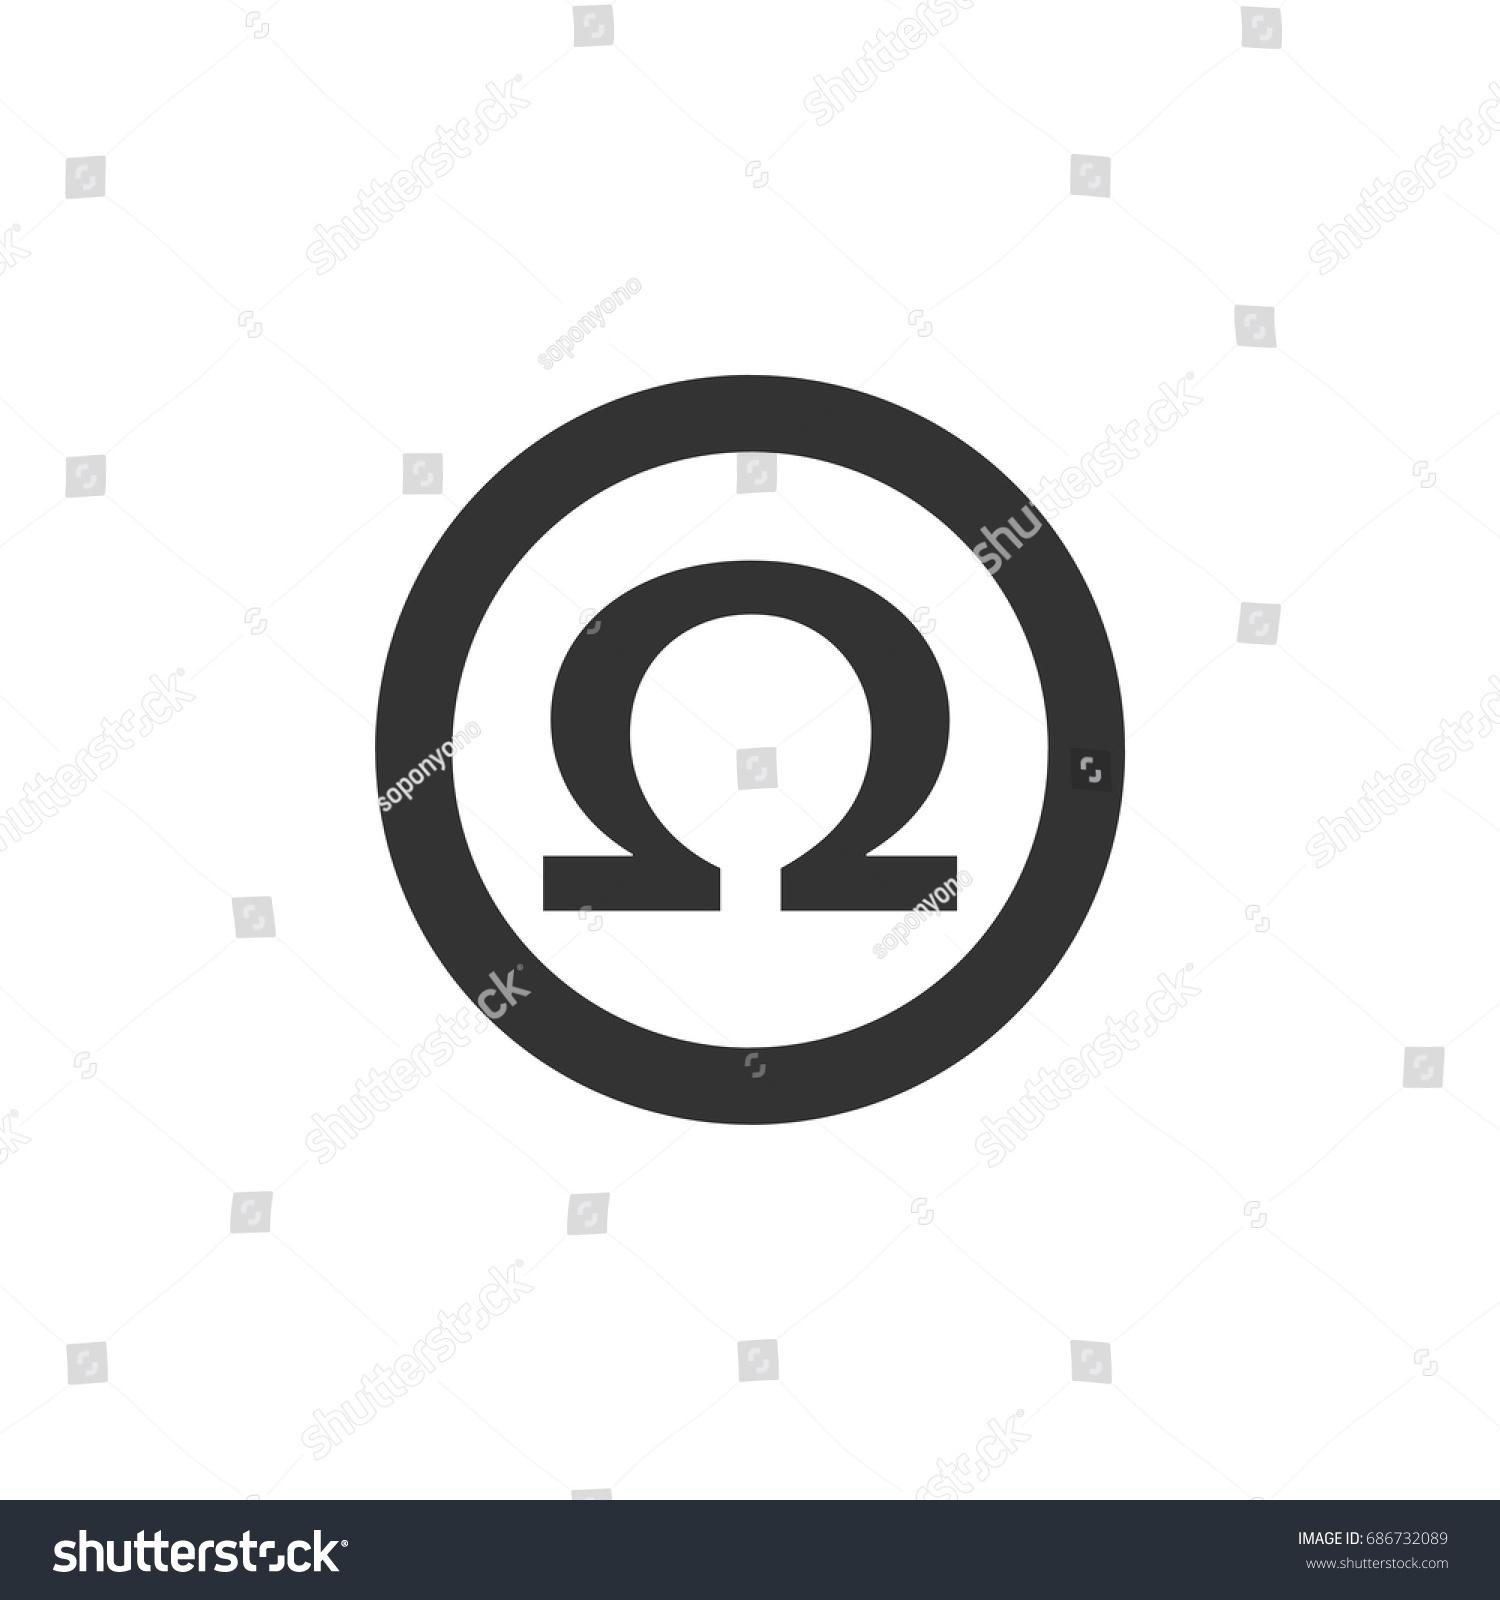 Omega sign logo template stock vector 686732089 shutterstock omega sign logo template biocorpaavc Gallery